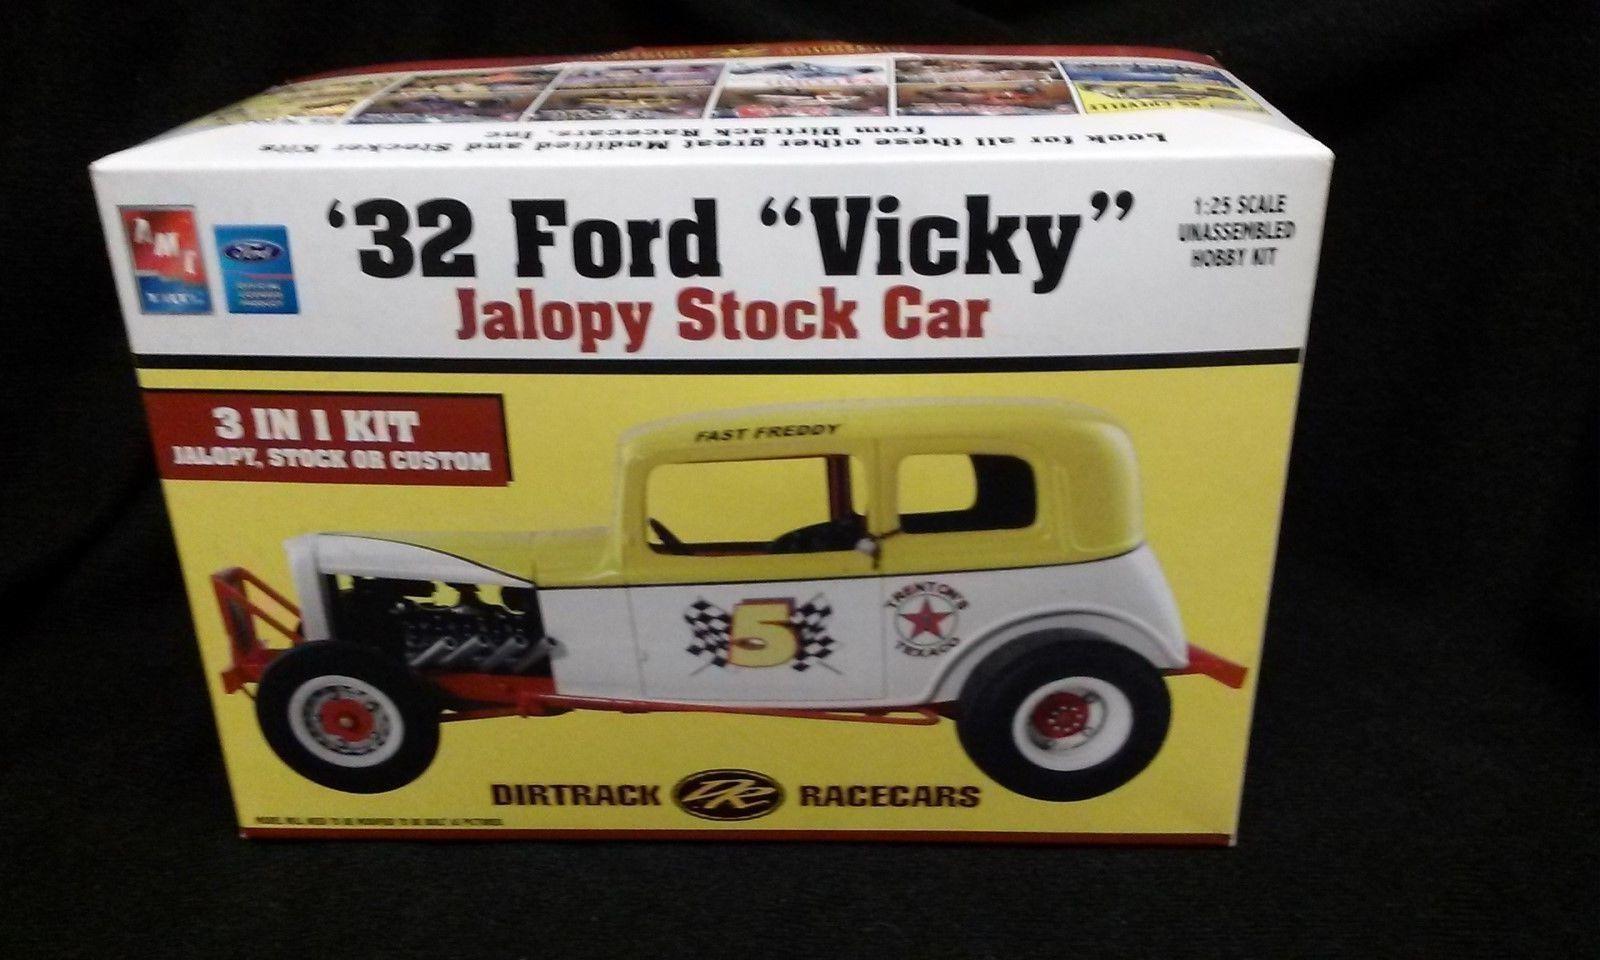 Amt 32 Ford Vicky Jalopy Stock Car Model Kit 21710 Opened 32